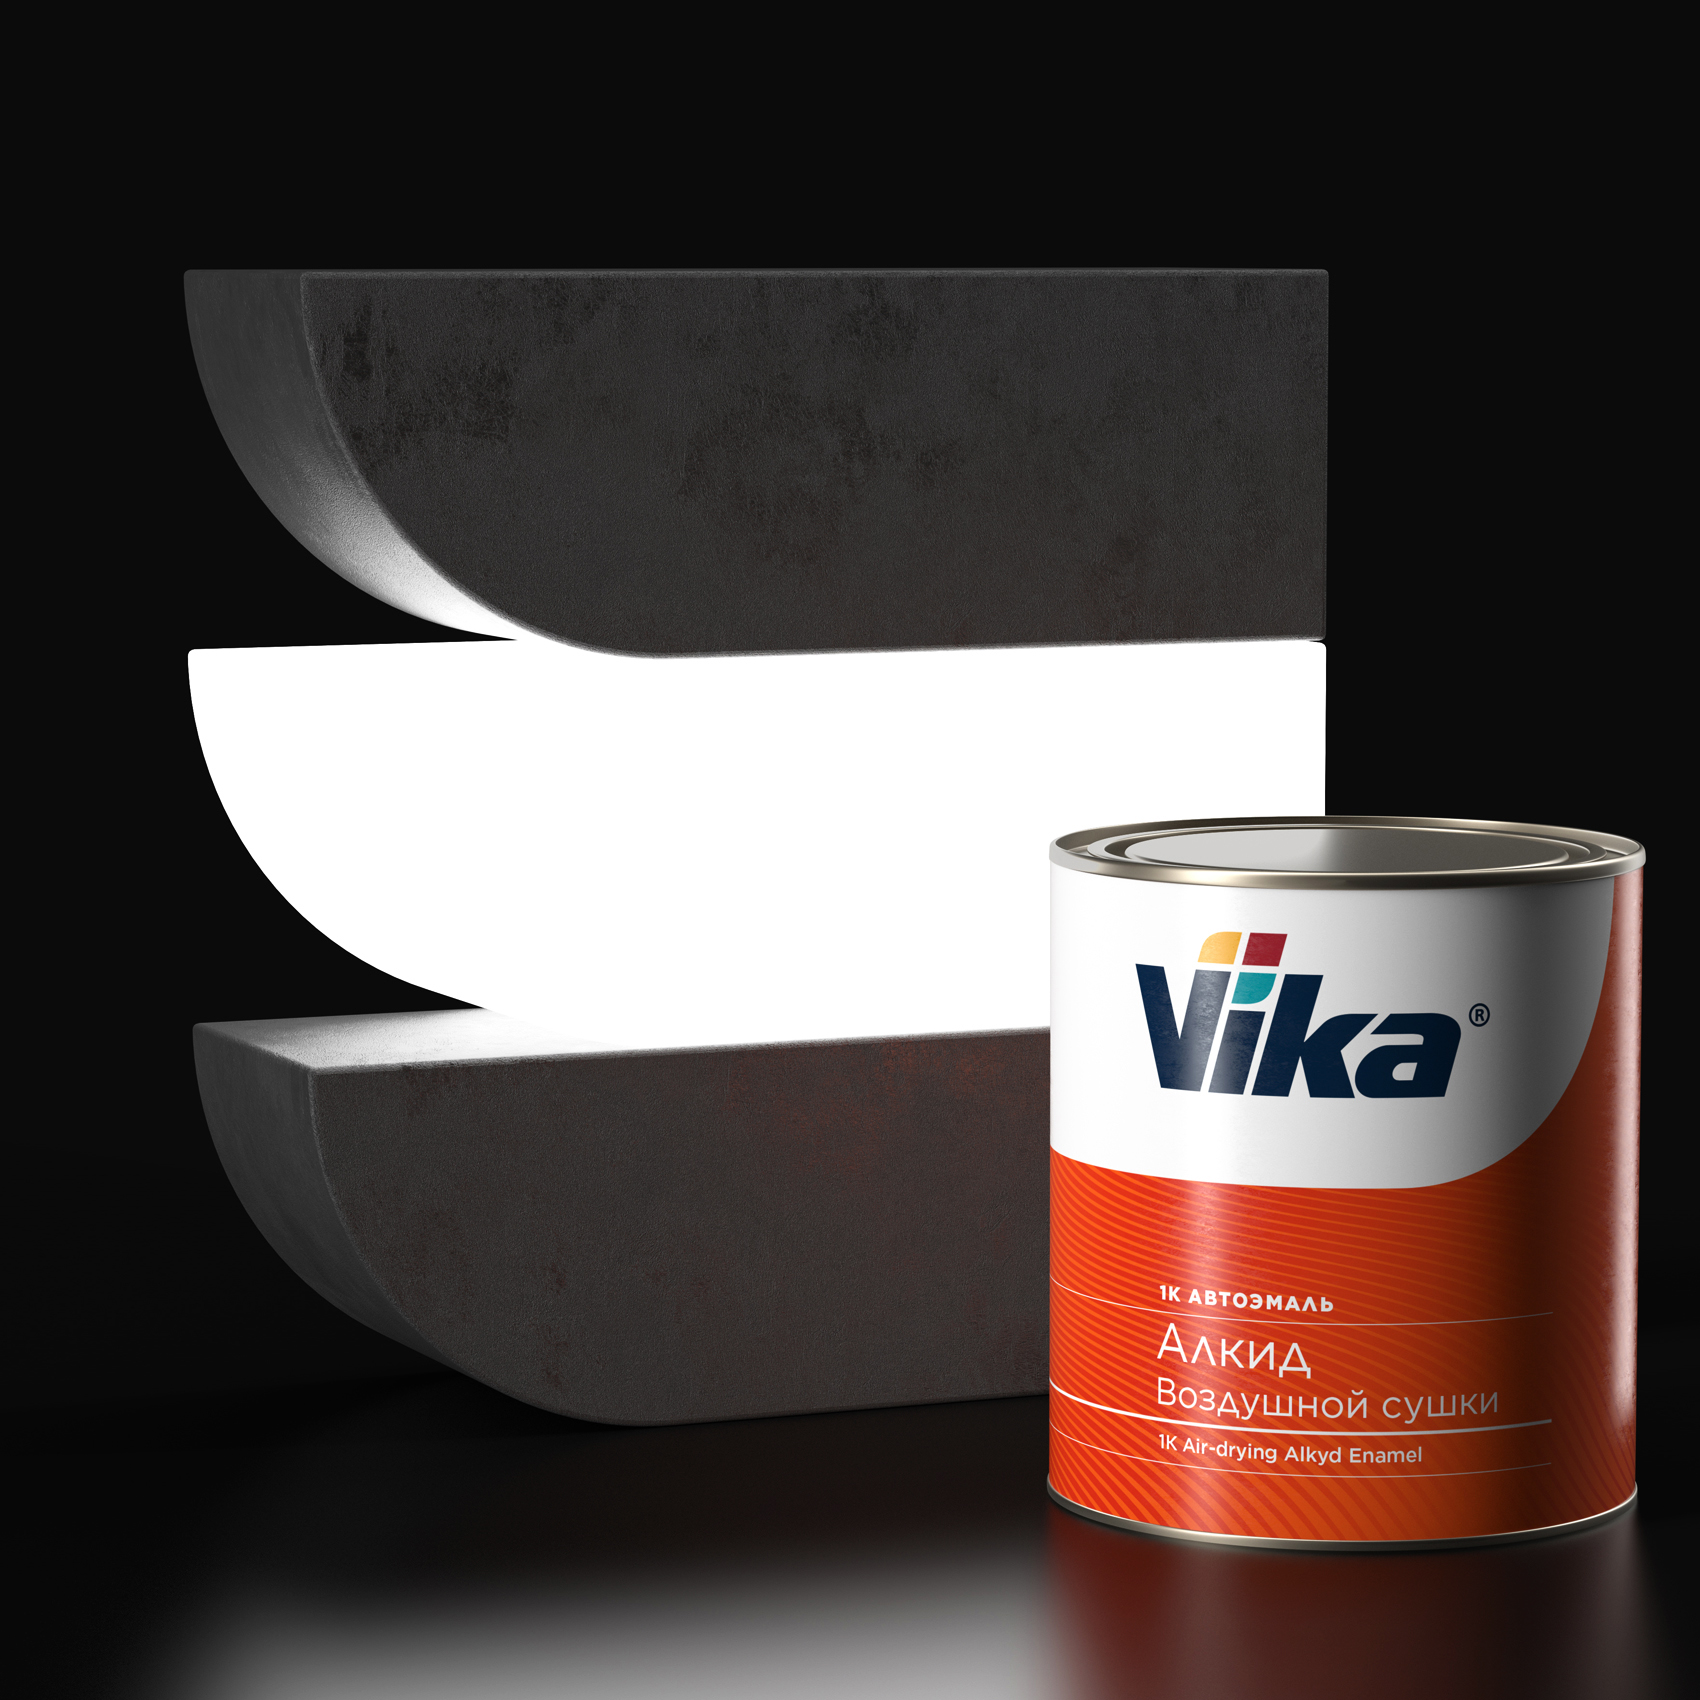 vika_1